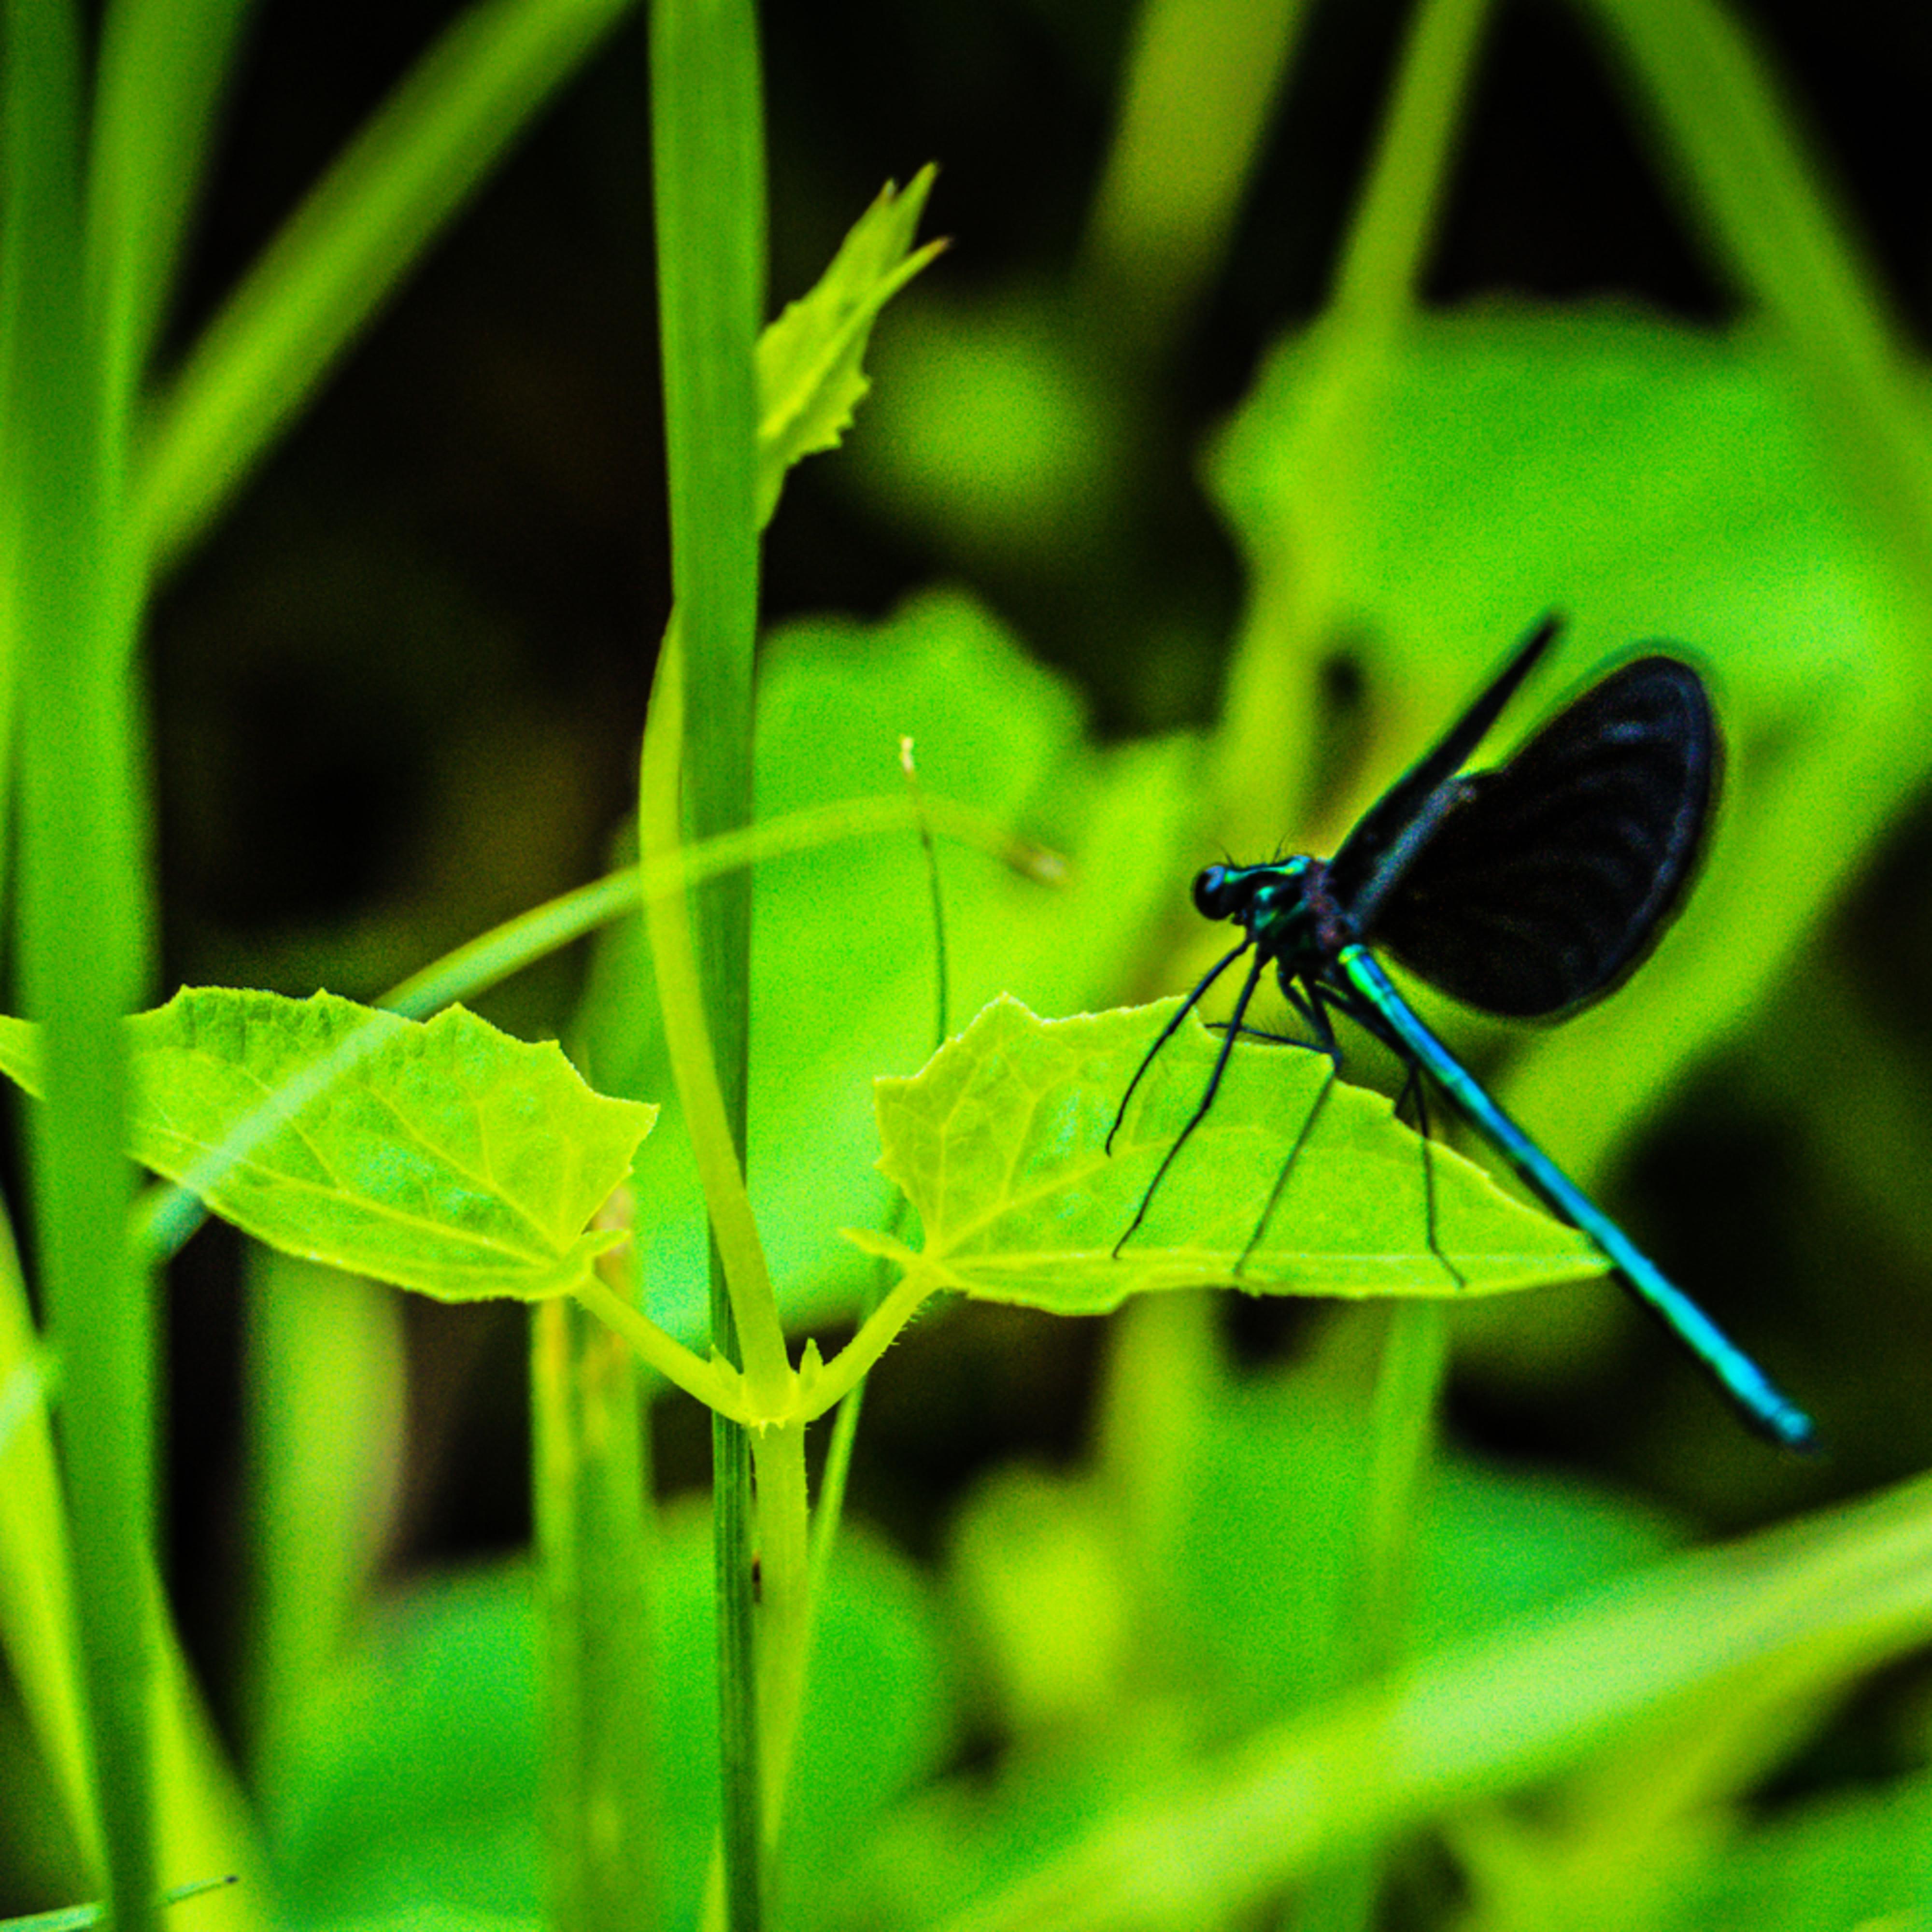 Blue dragon fly dsc03416 lg d5cyxd